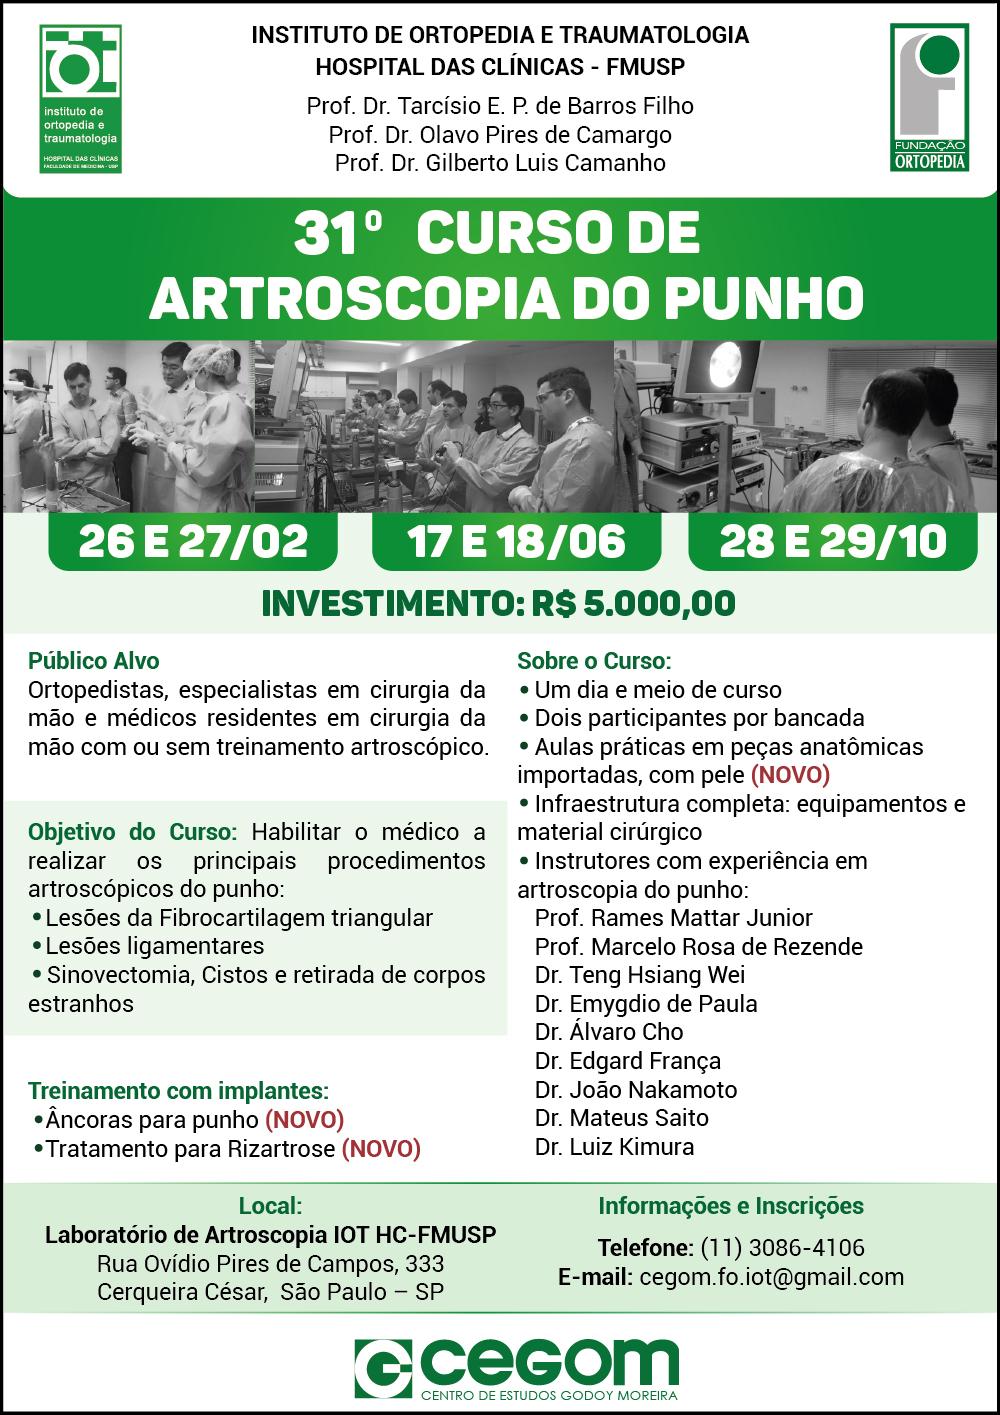 Curso-de-Artroscopia-do-Punho-MÓDULO-BÁSICO (1).jpg